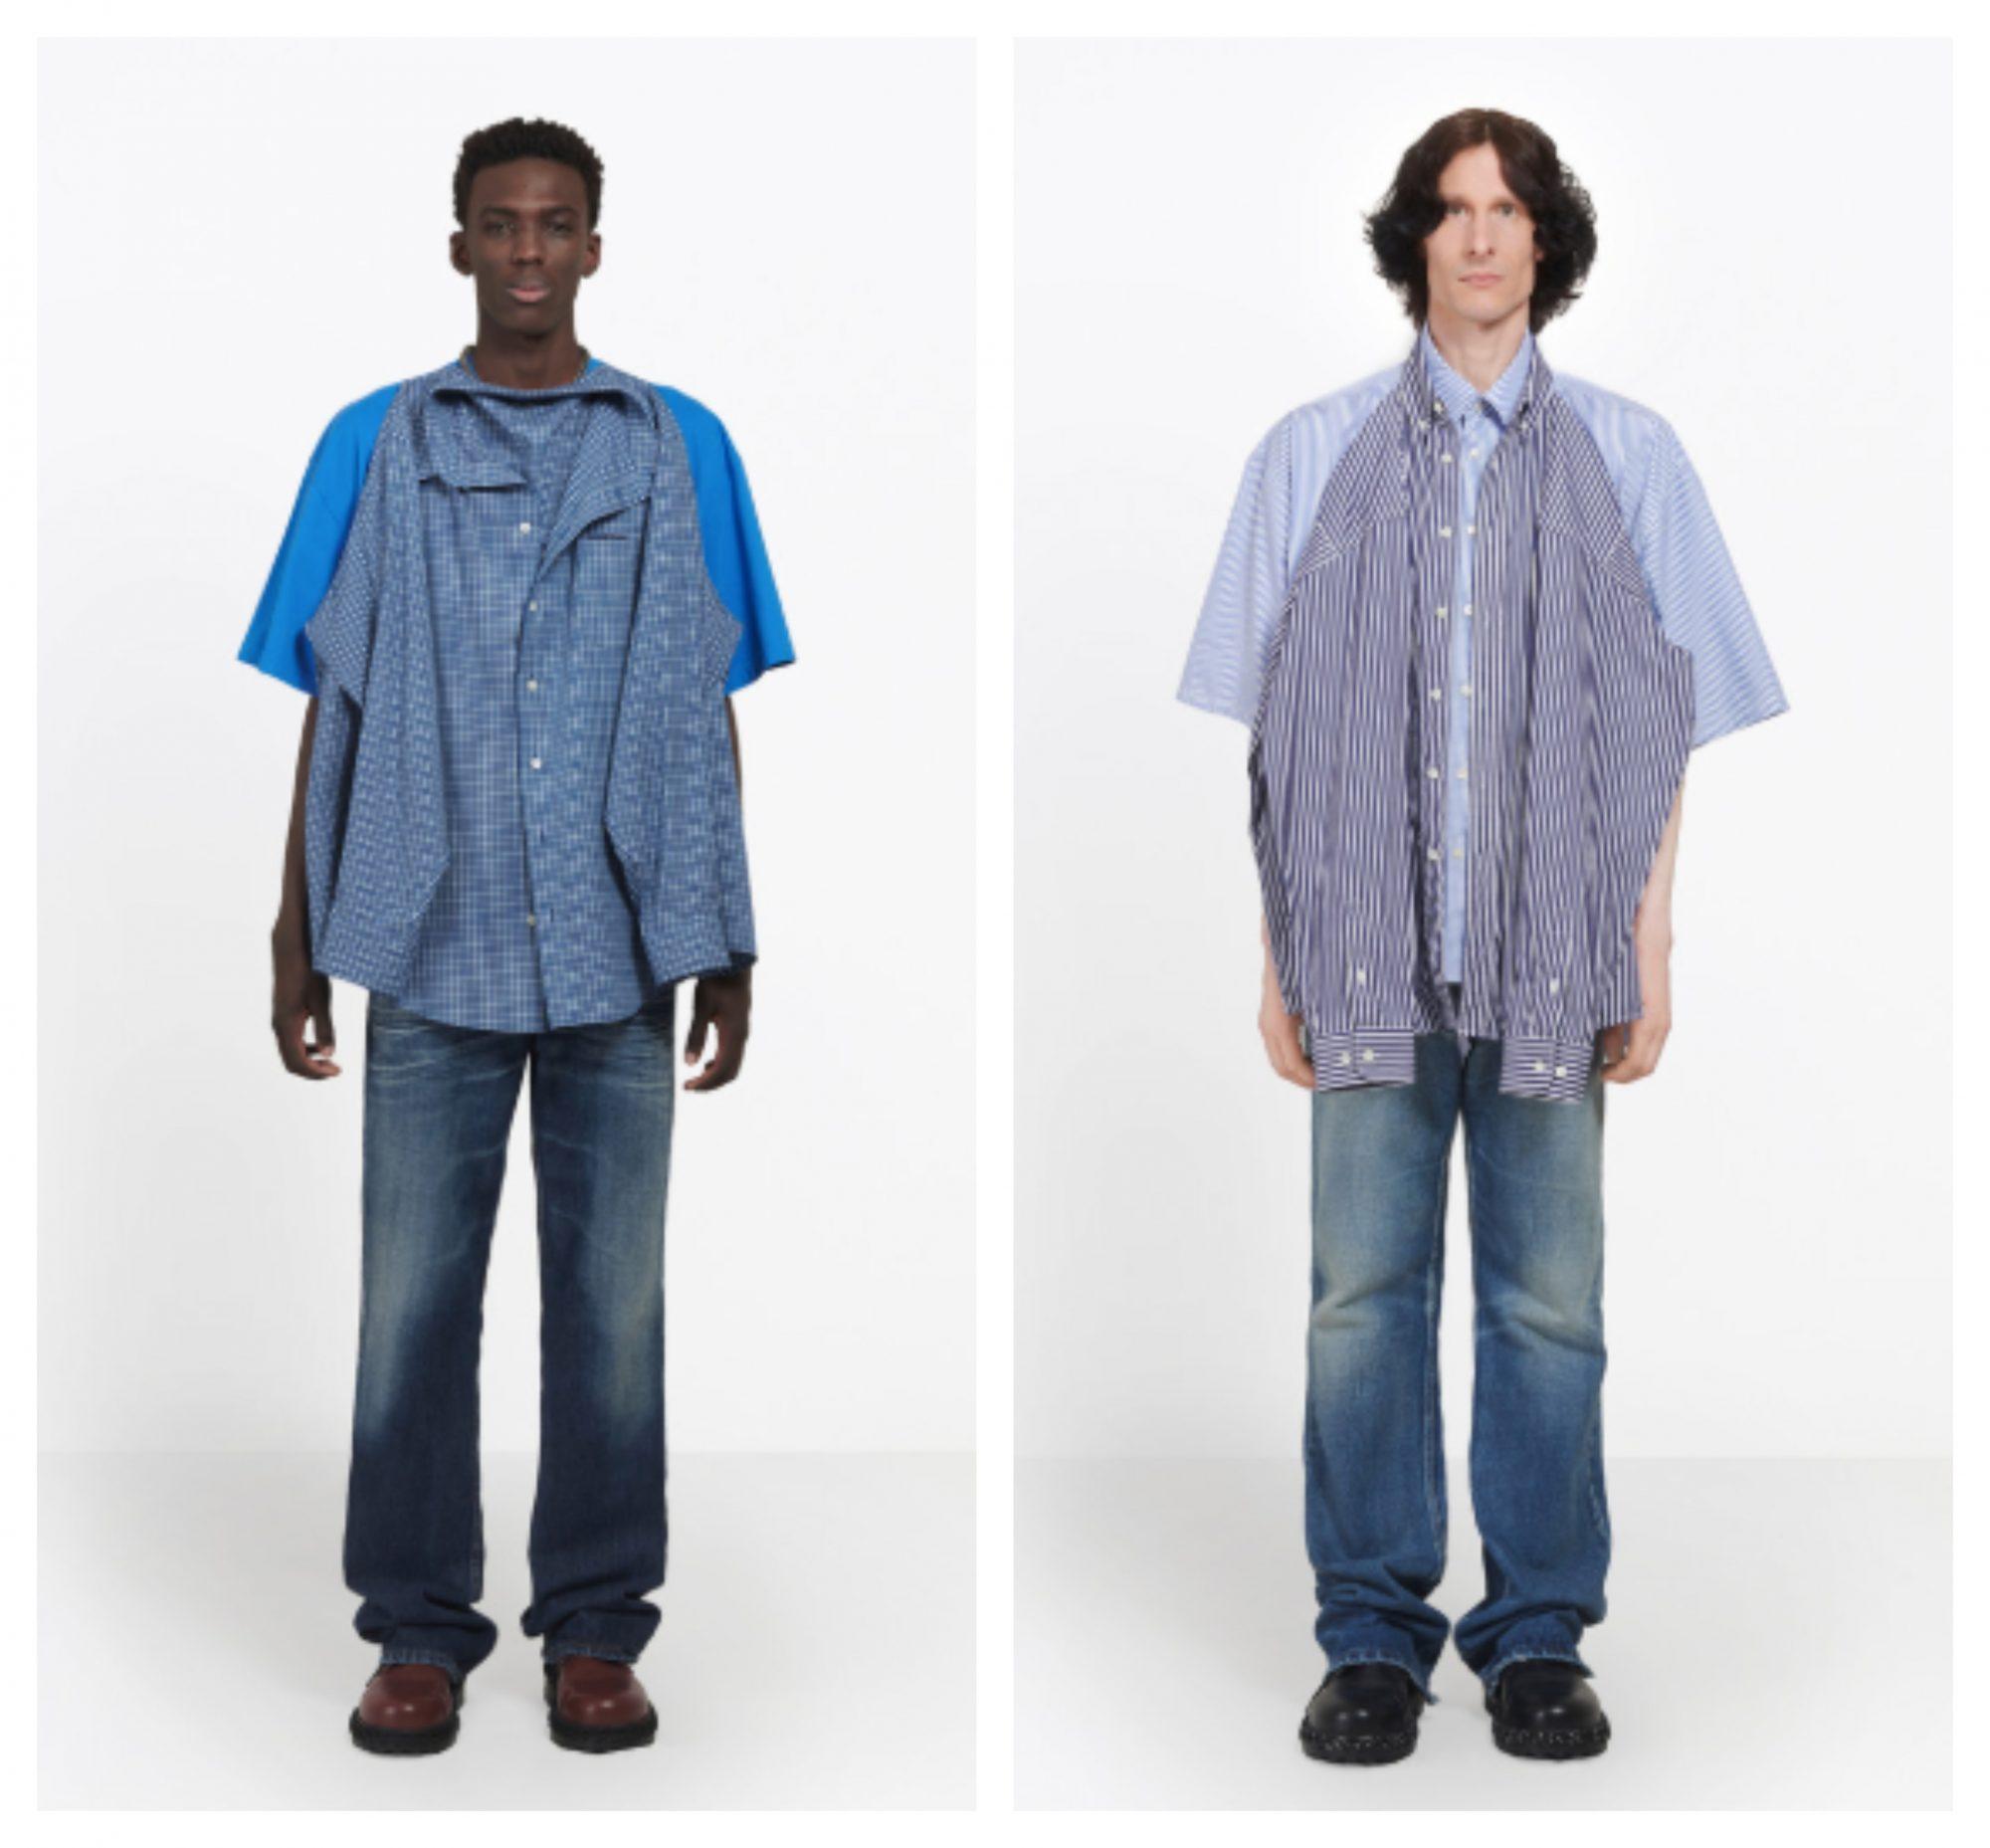 balenciaga-t-shirt-shirt-double-shirt.jpg